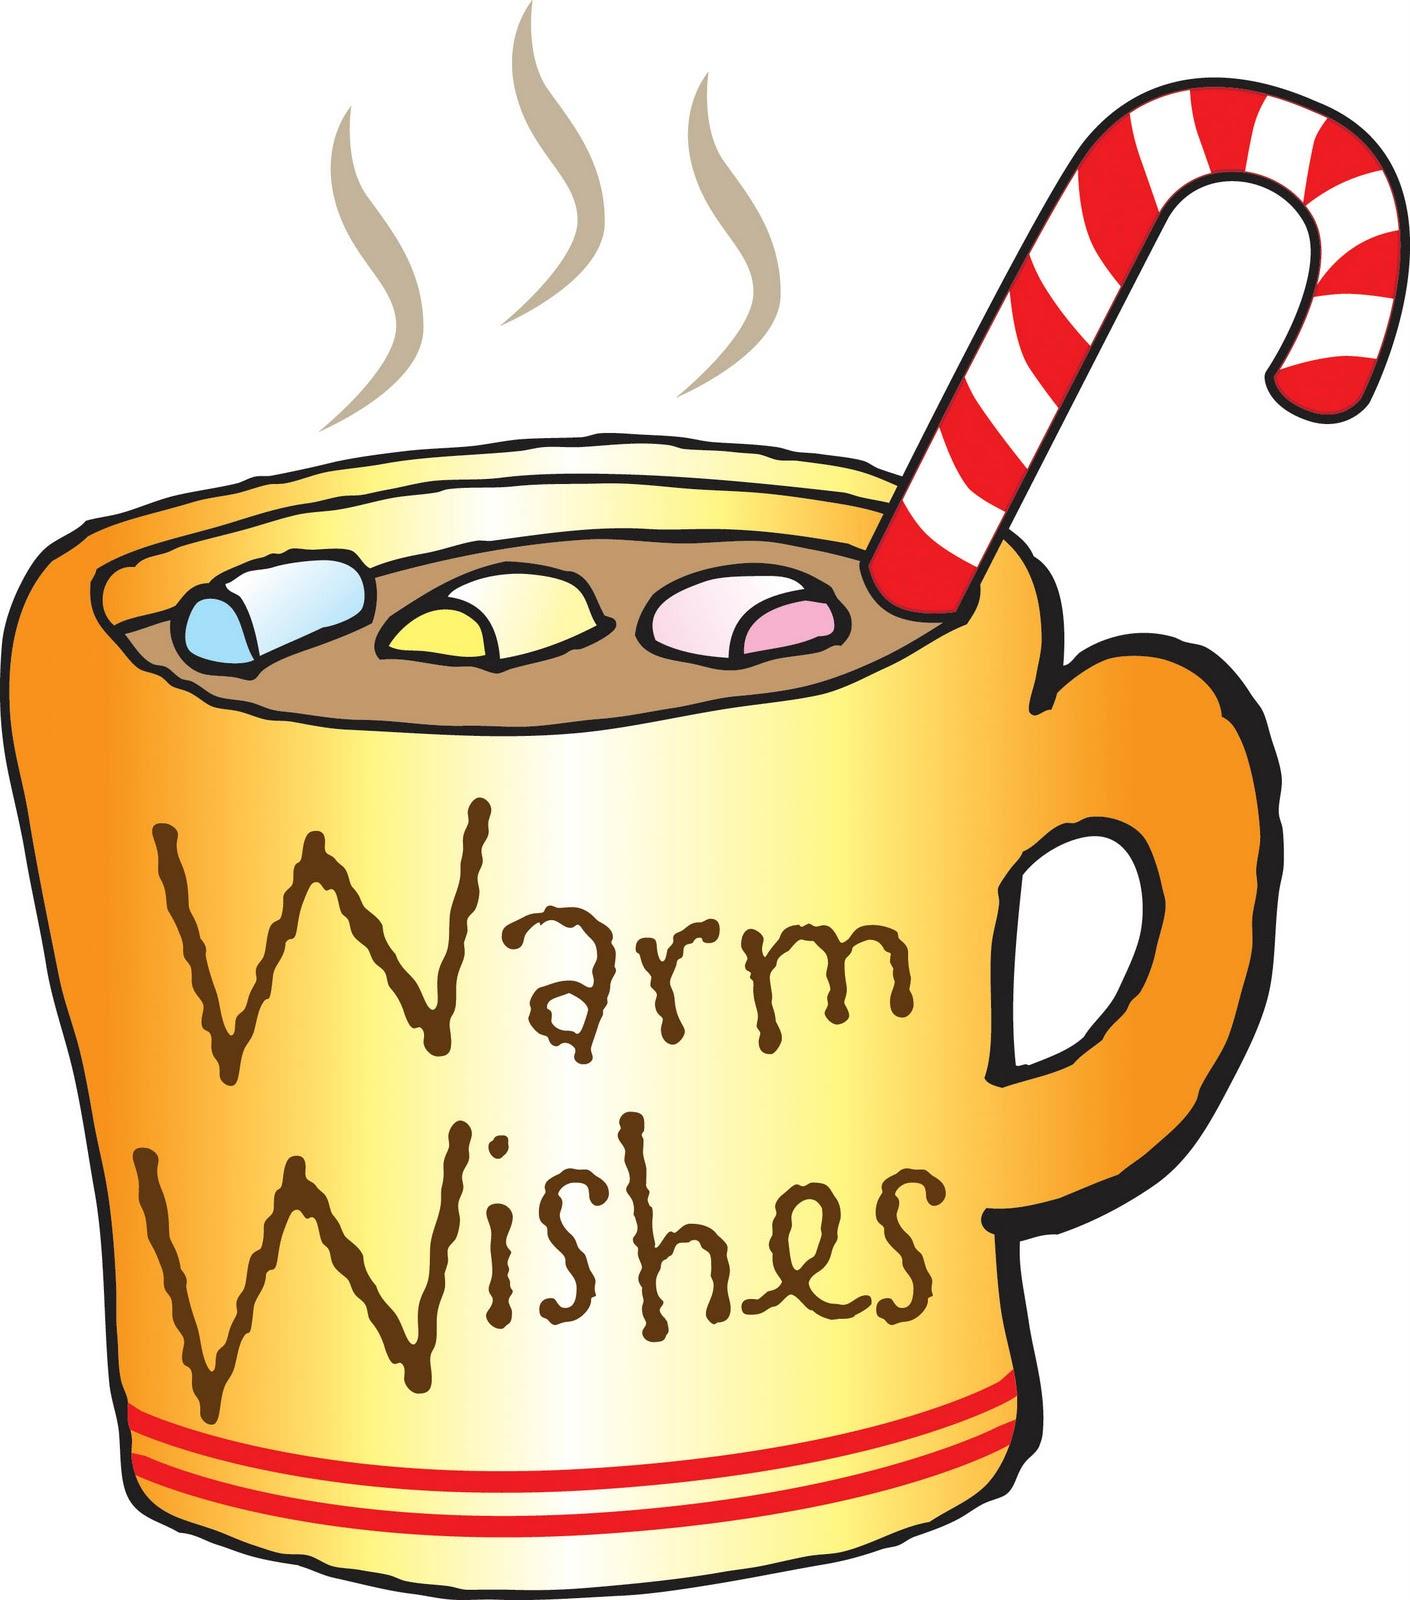 warmth clipart - photo #1